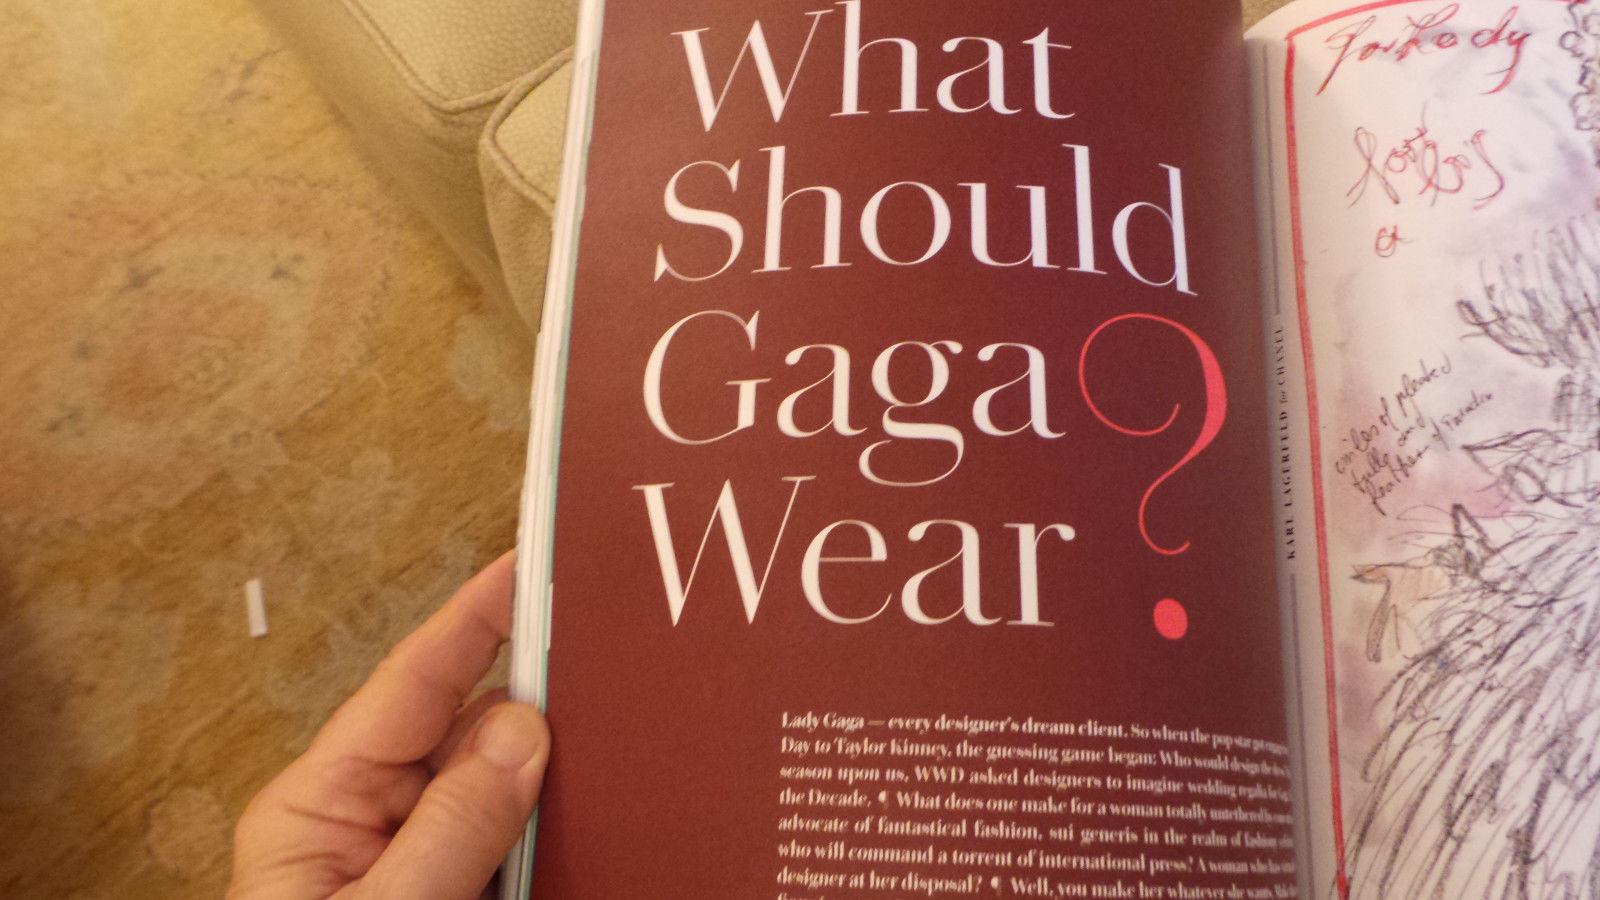 WWD Mag Lady Gaga Wedding Dresses; Salma Hayek; Rob Lowe; Tom Tait 5/2015 #3 NF